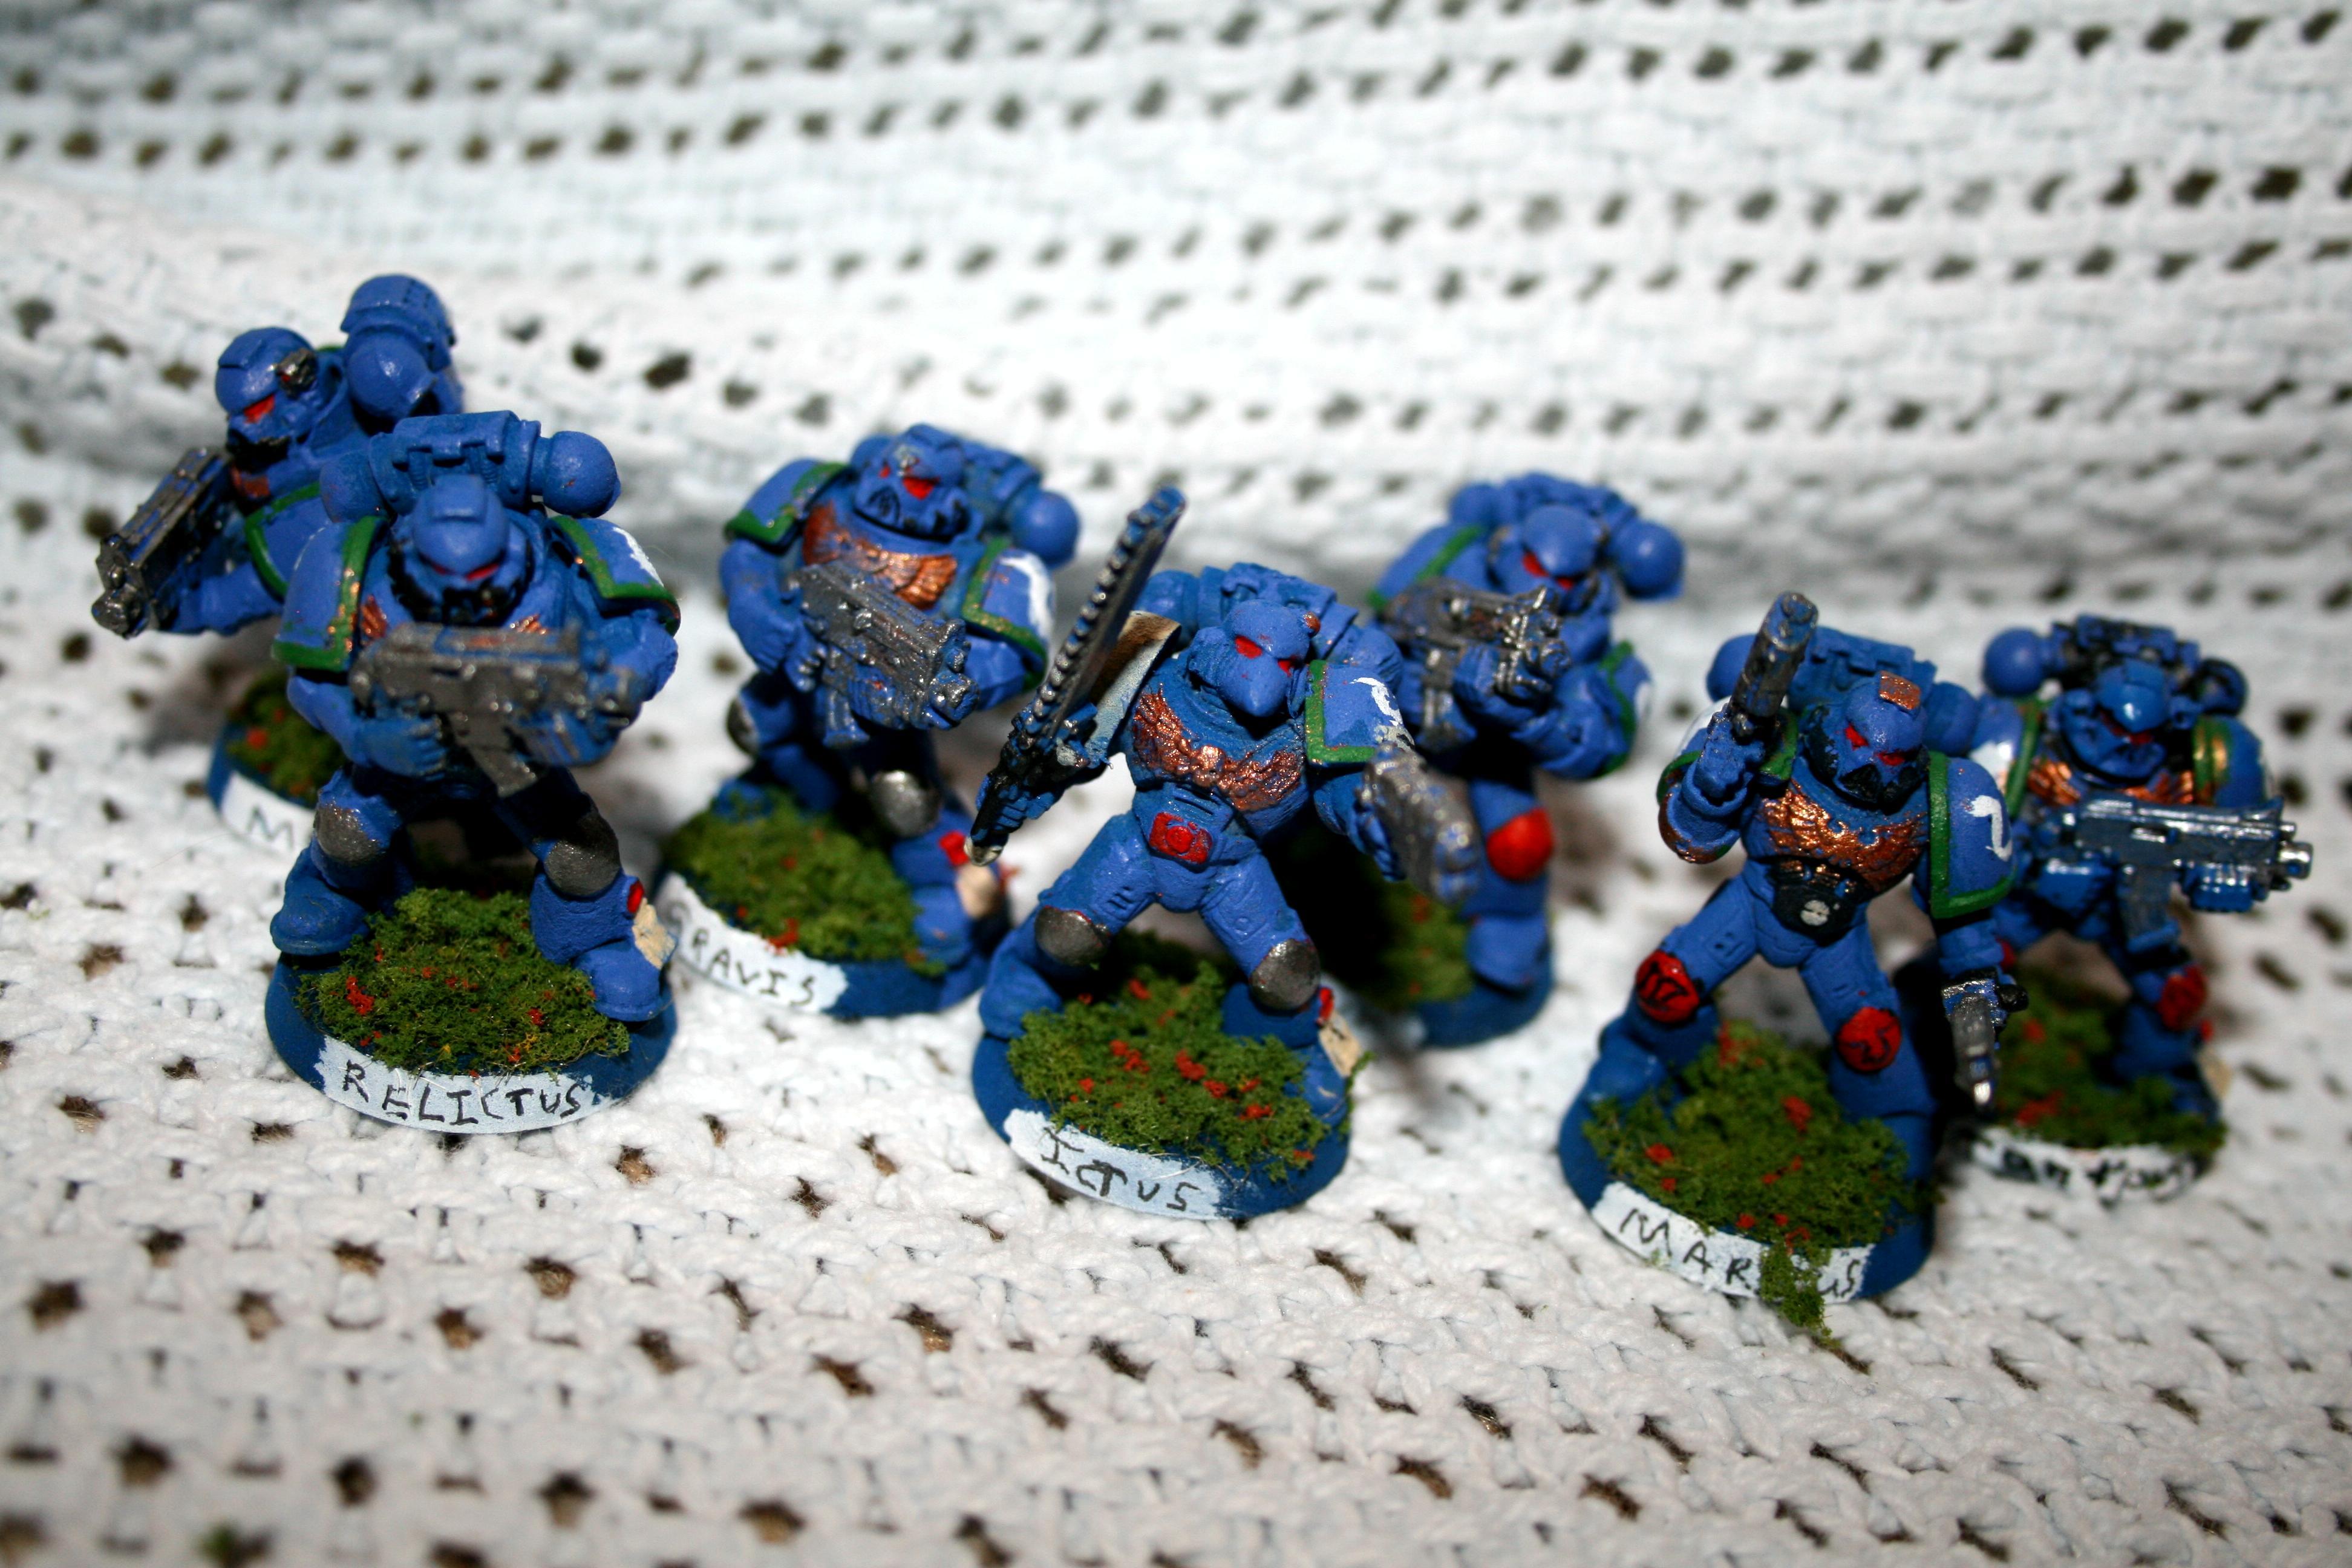 Army, Campaign, Space, Space Marines, Ultramar, Ultramarines, Zeist